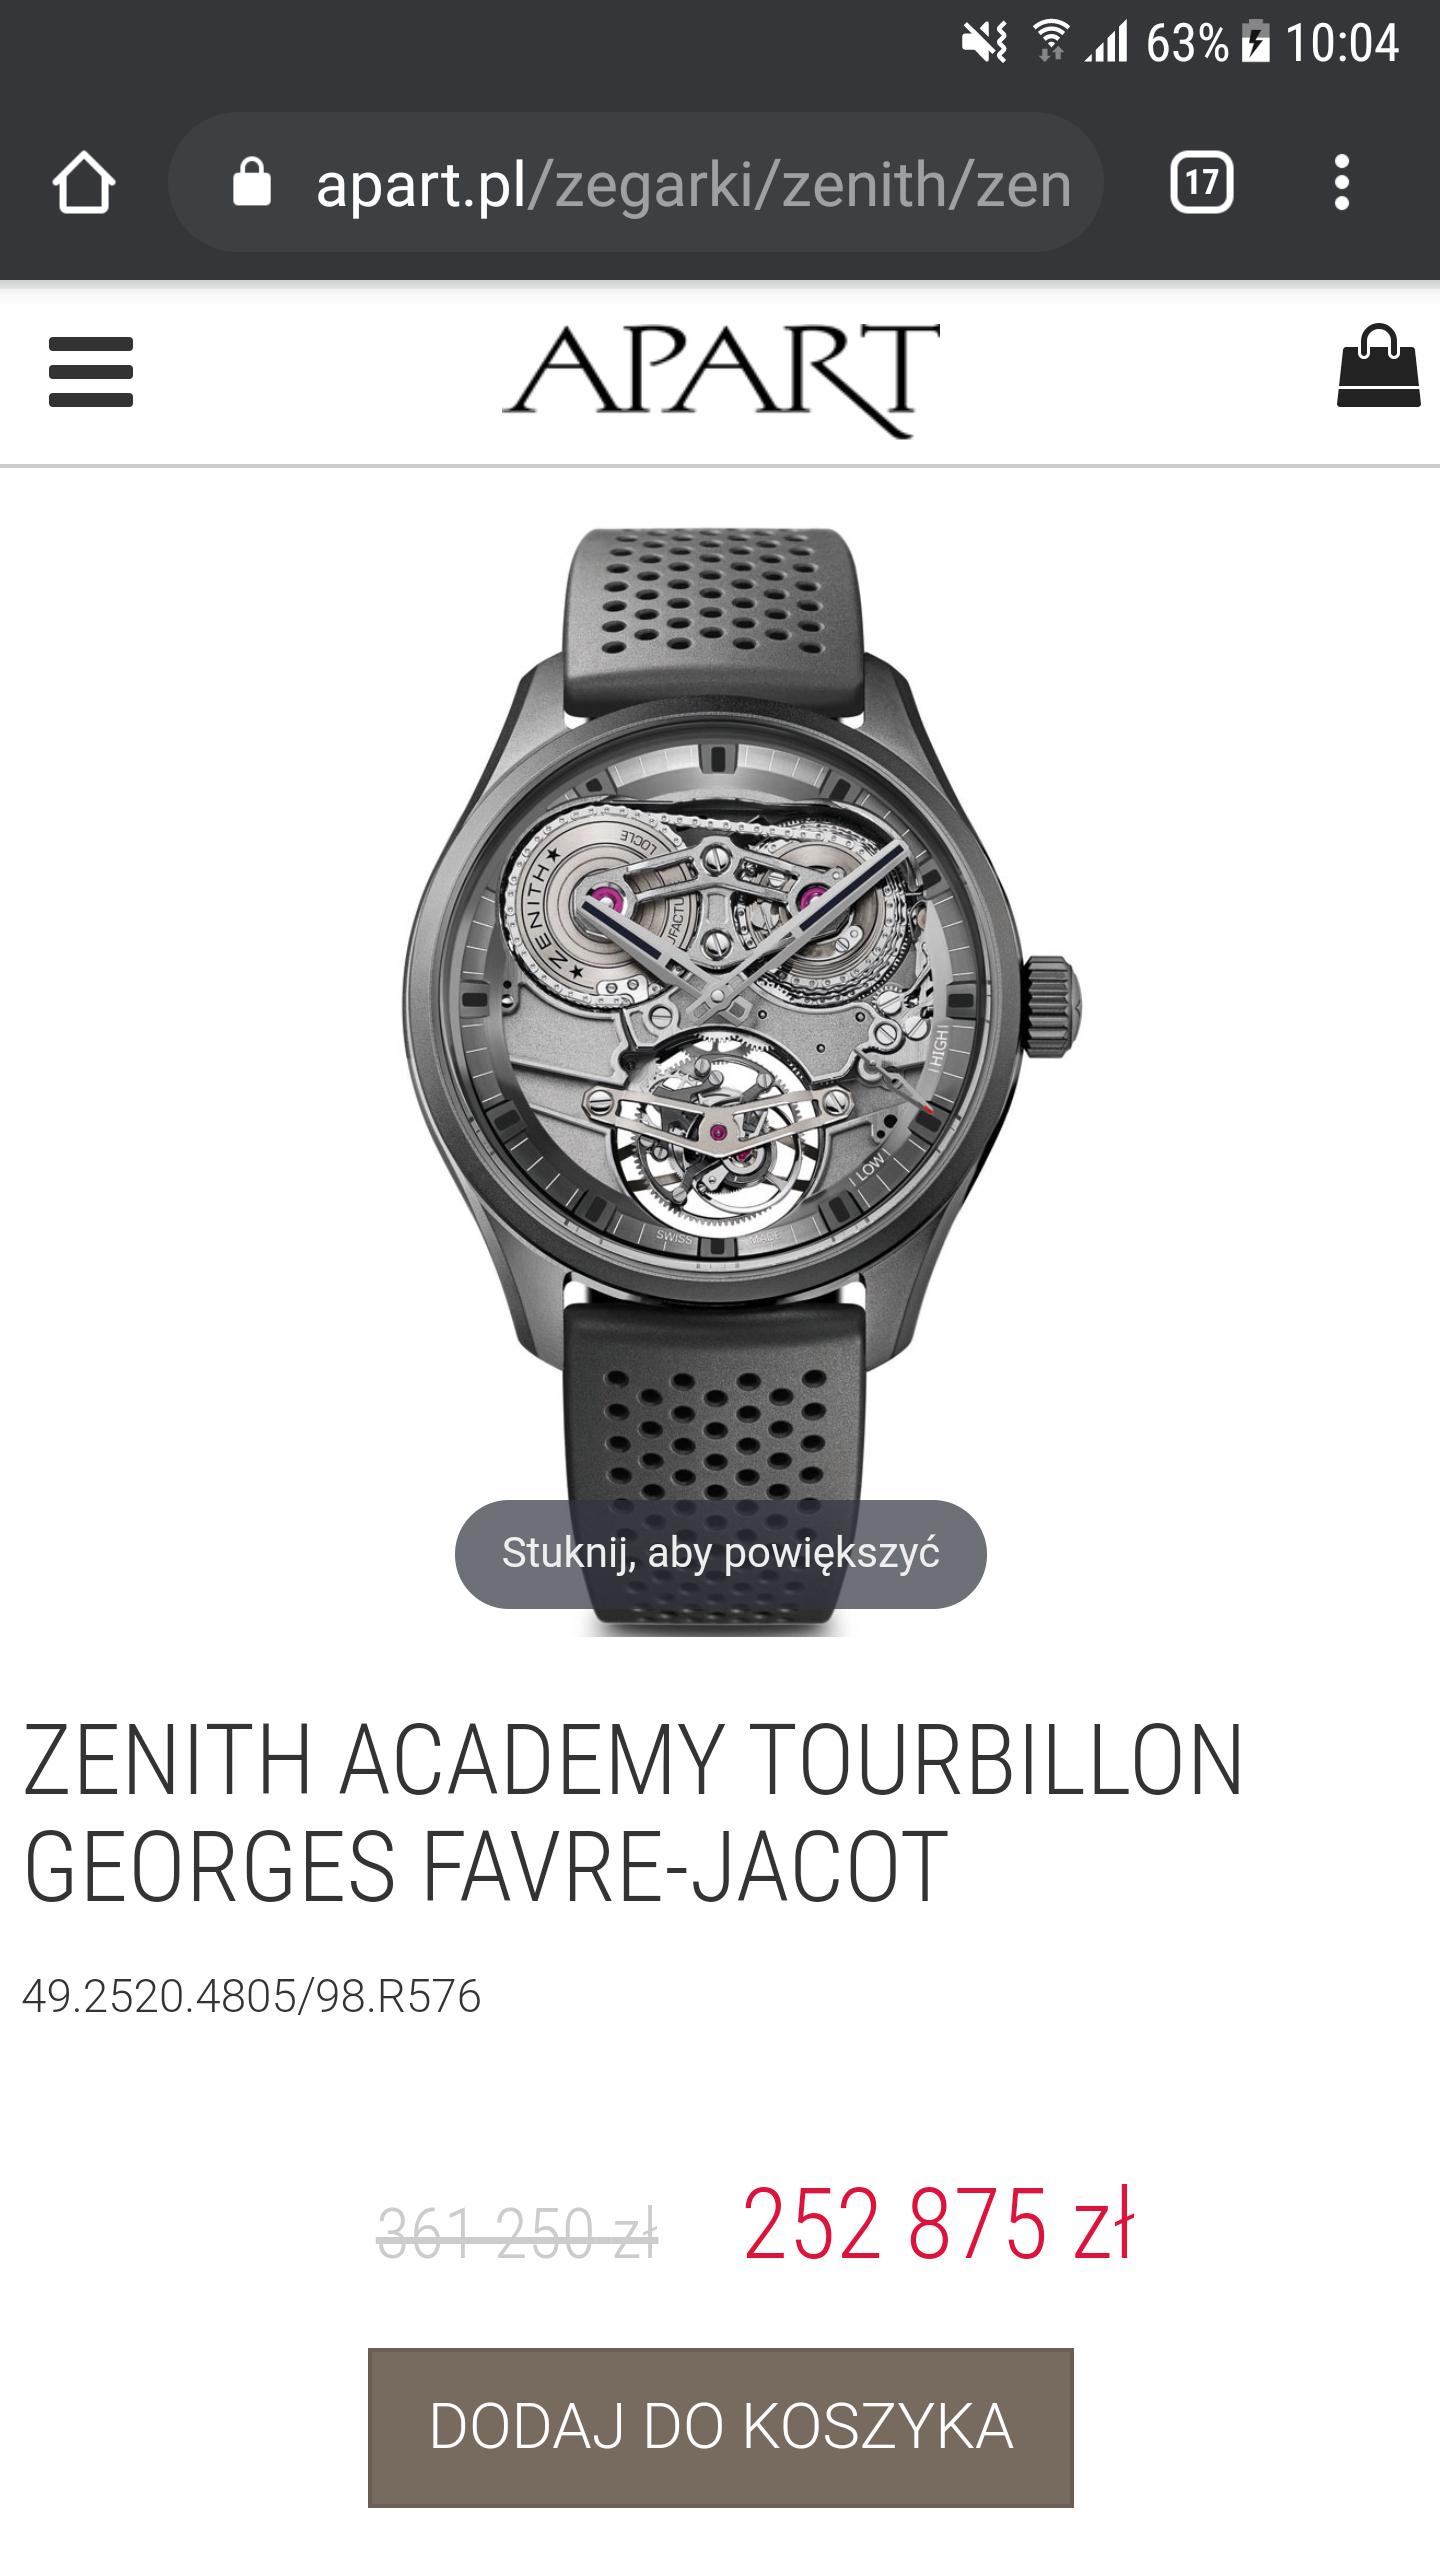 ZENITH ACADEMY TOURBILLON GEORGES FAVRE-JACOT